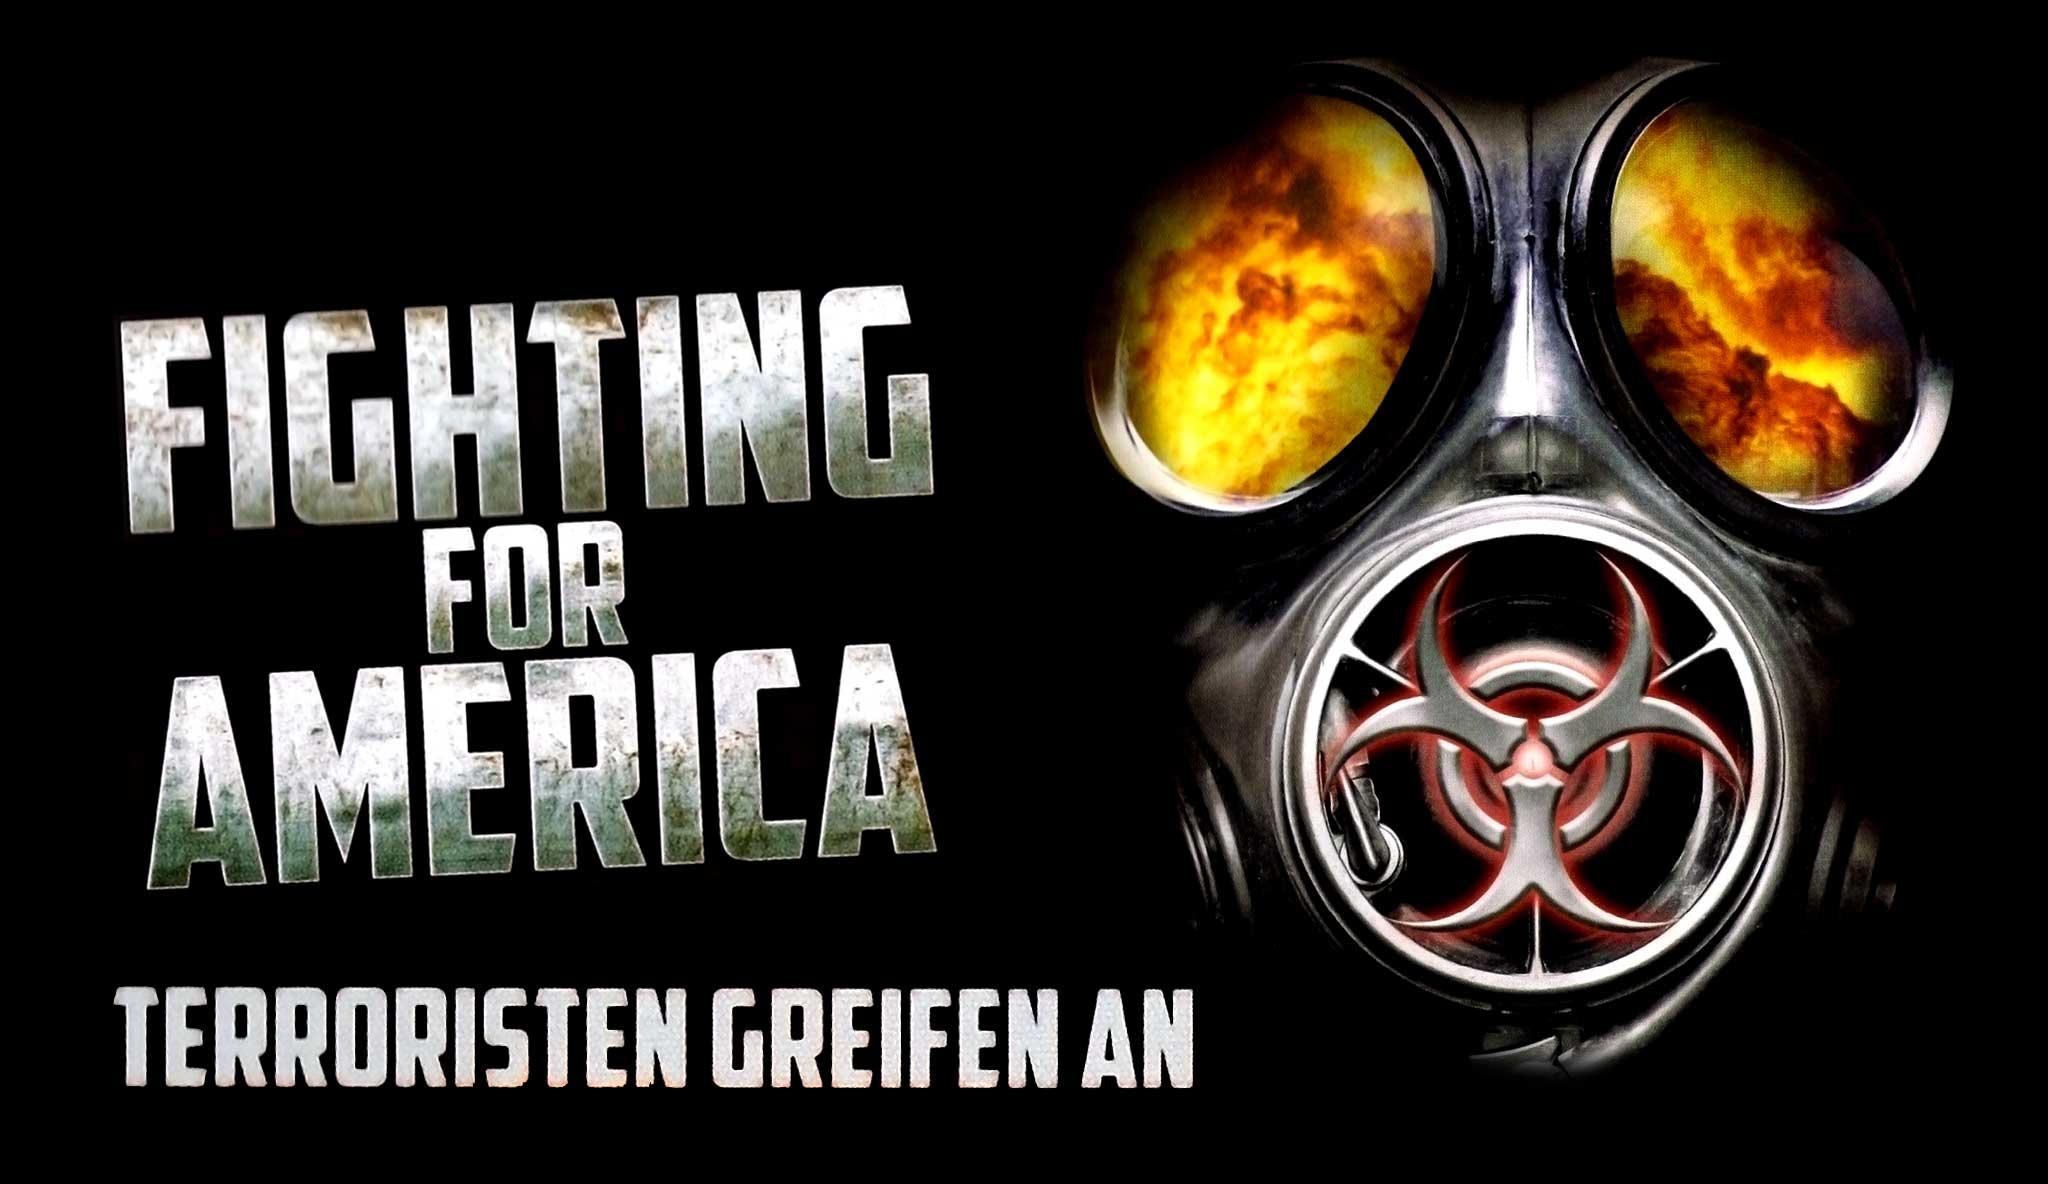 fighting-for-america-terroristen-greifen-an\header.jpg